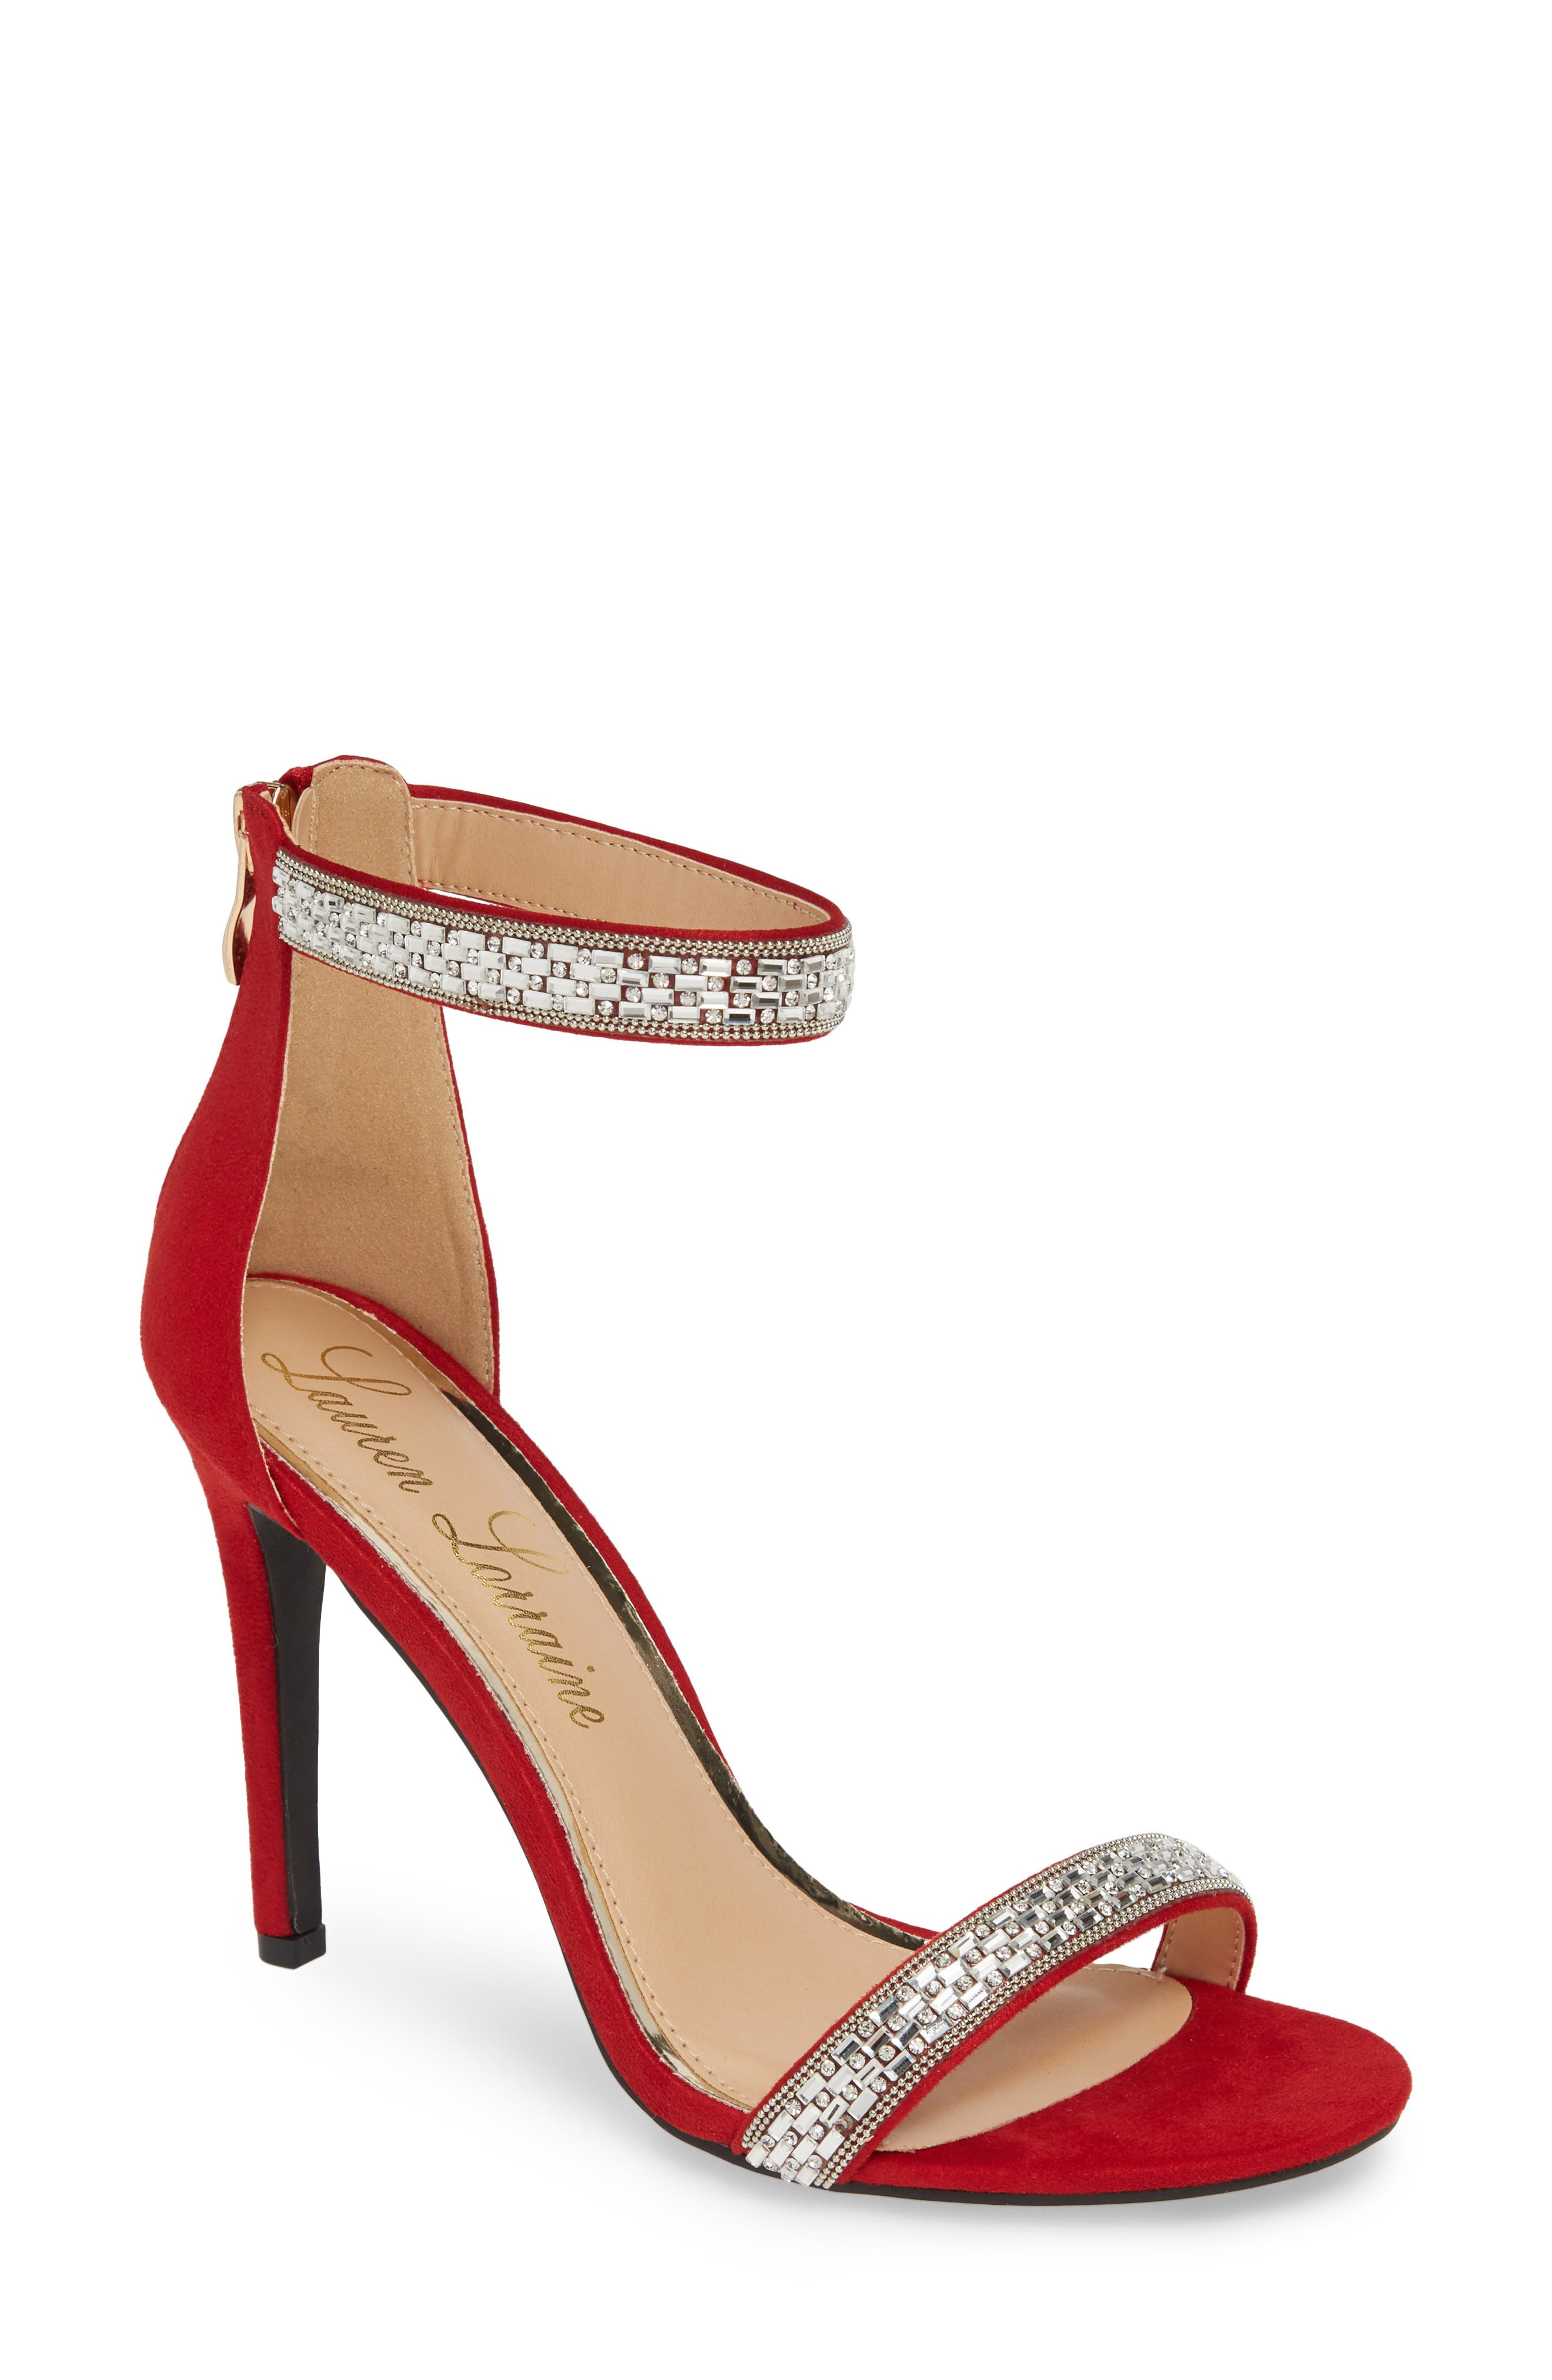 Lauren Lorraine Nesha Crystal Stiletto Sandal, Red